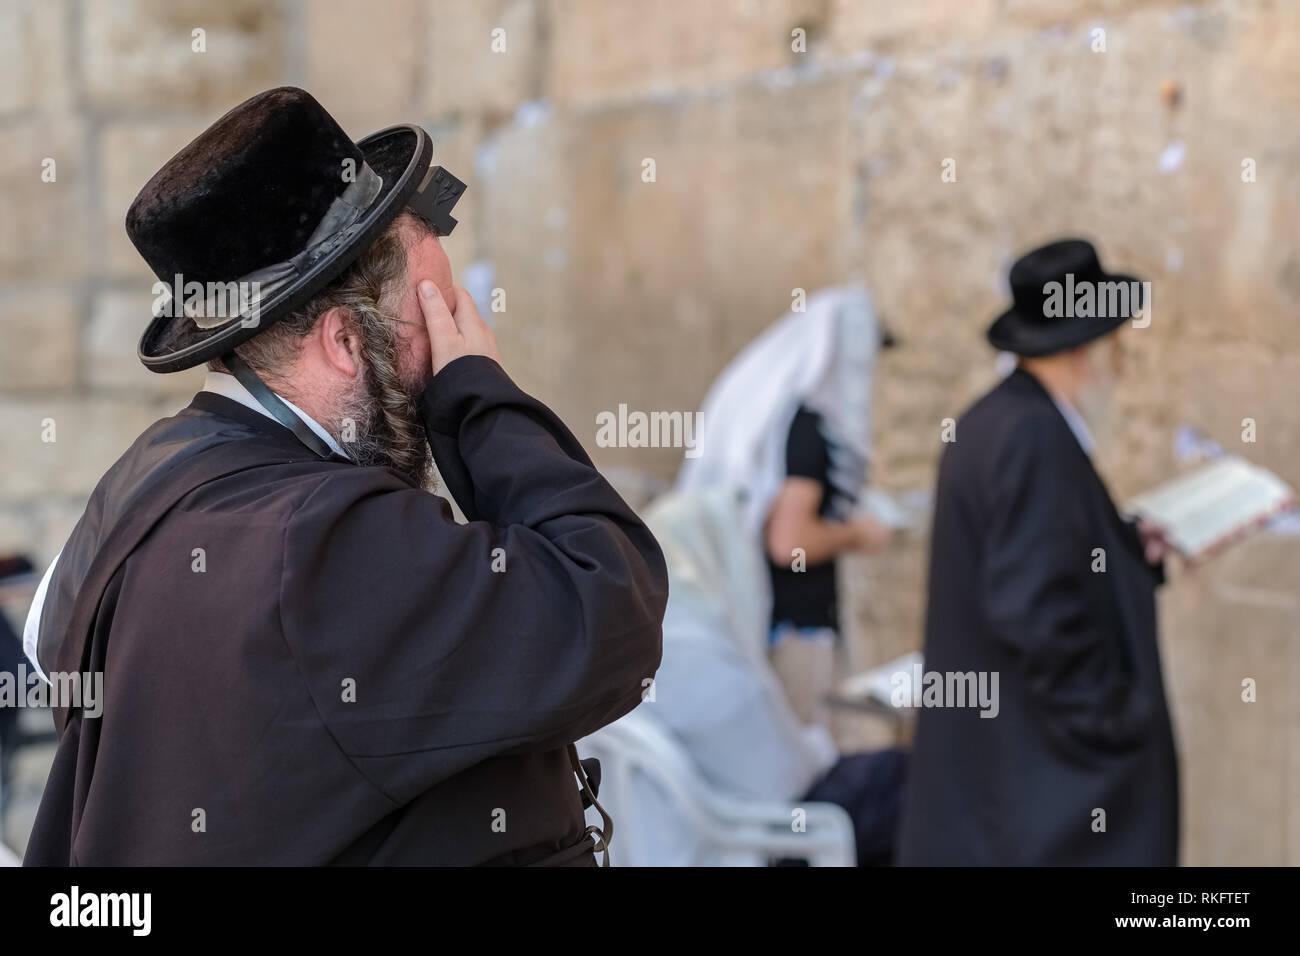 Jerusalem, Israel - November 20, 2018: Religious orthodox jew praying at the Western wall in Jerusalem - Stock Image